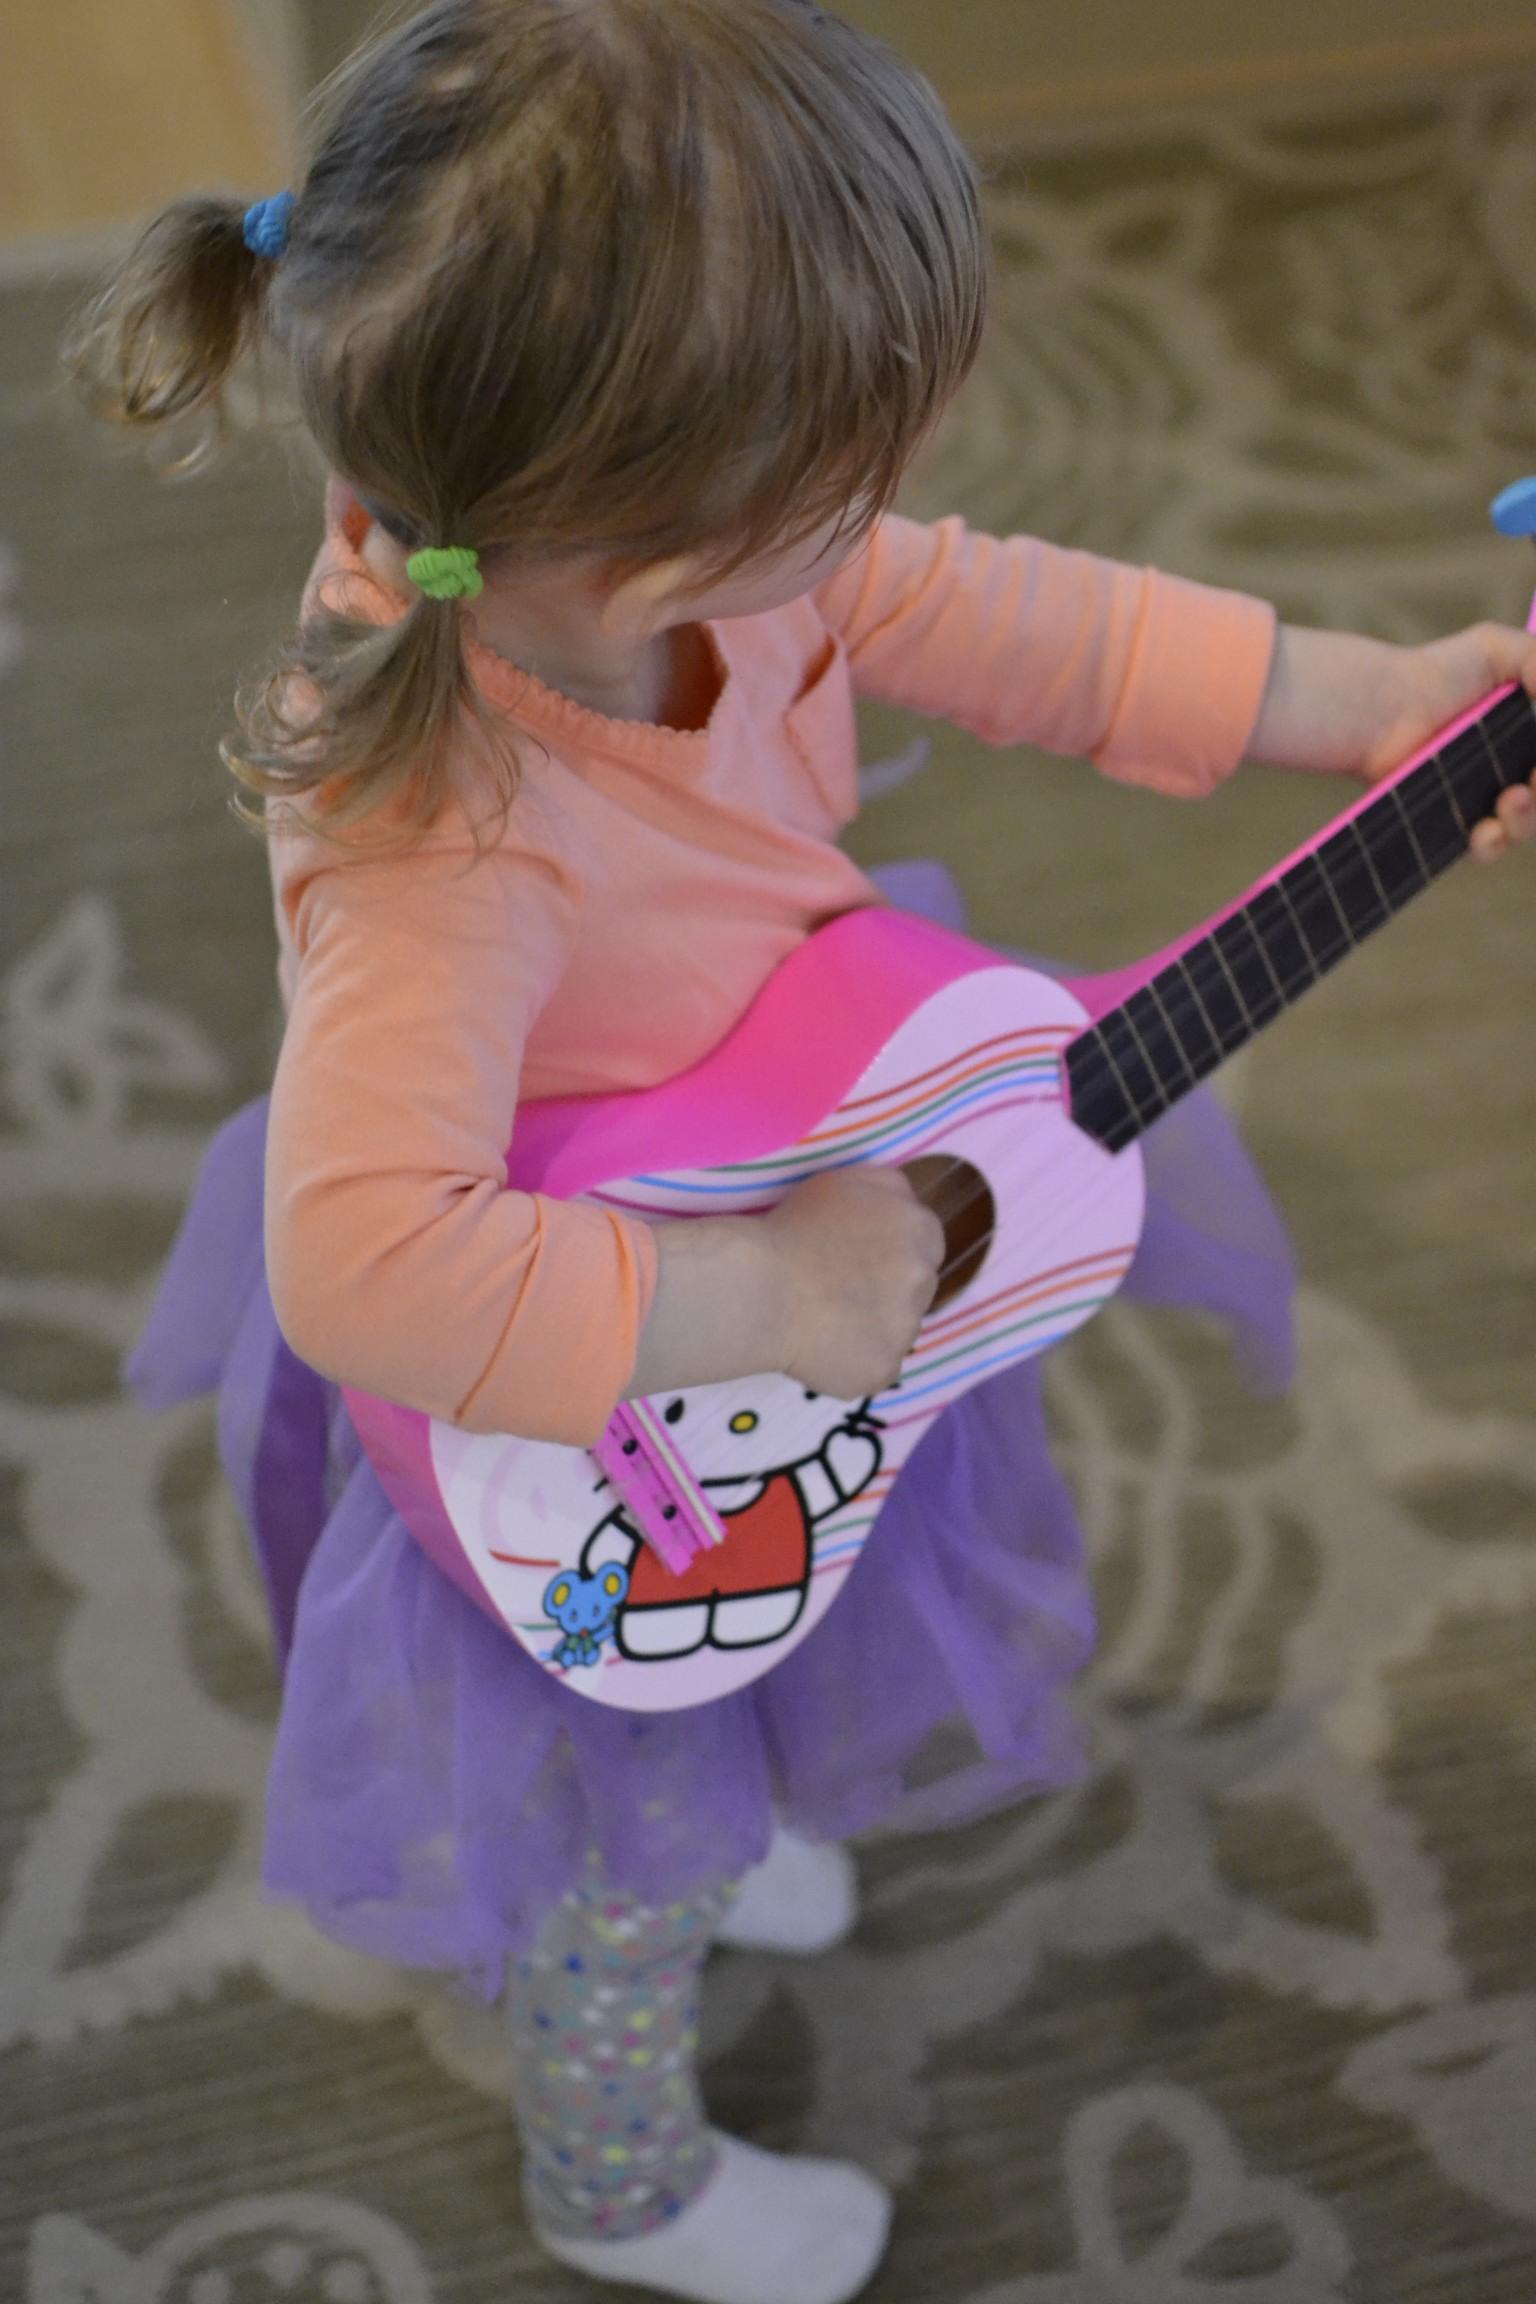 purple tutu wearing and guitar playing...